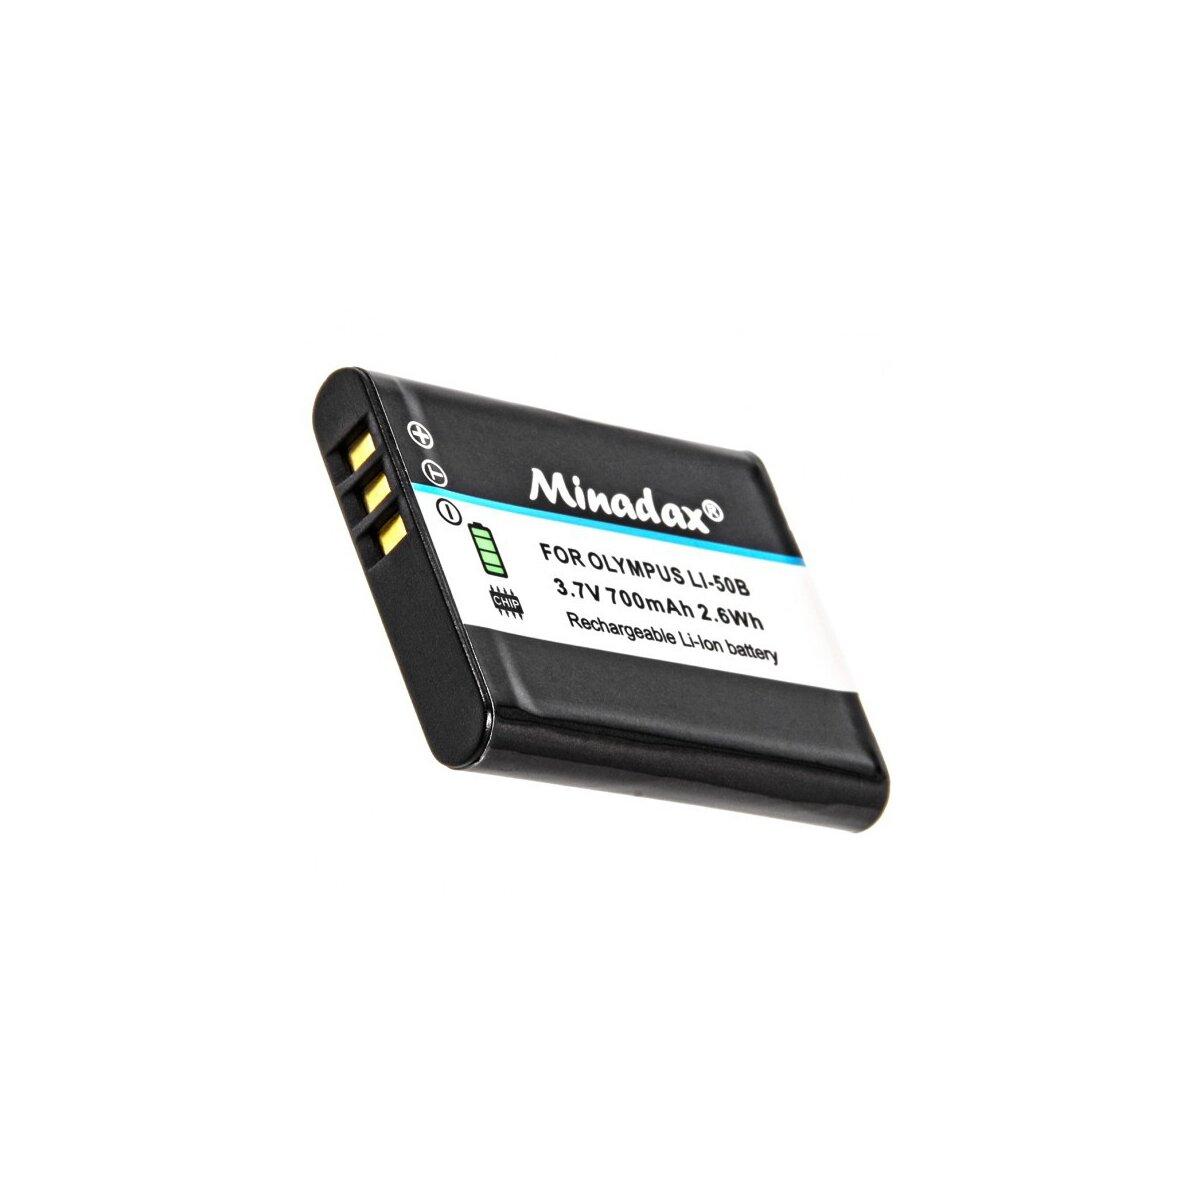 Minadax® Qualitaetsakku mit echten 700 mAh fuer Olympus, wie LI-50B - Intelligentes Akkusystem mit Chip